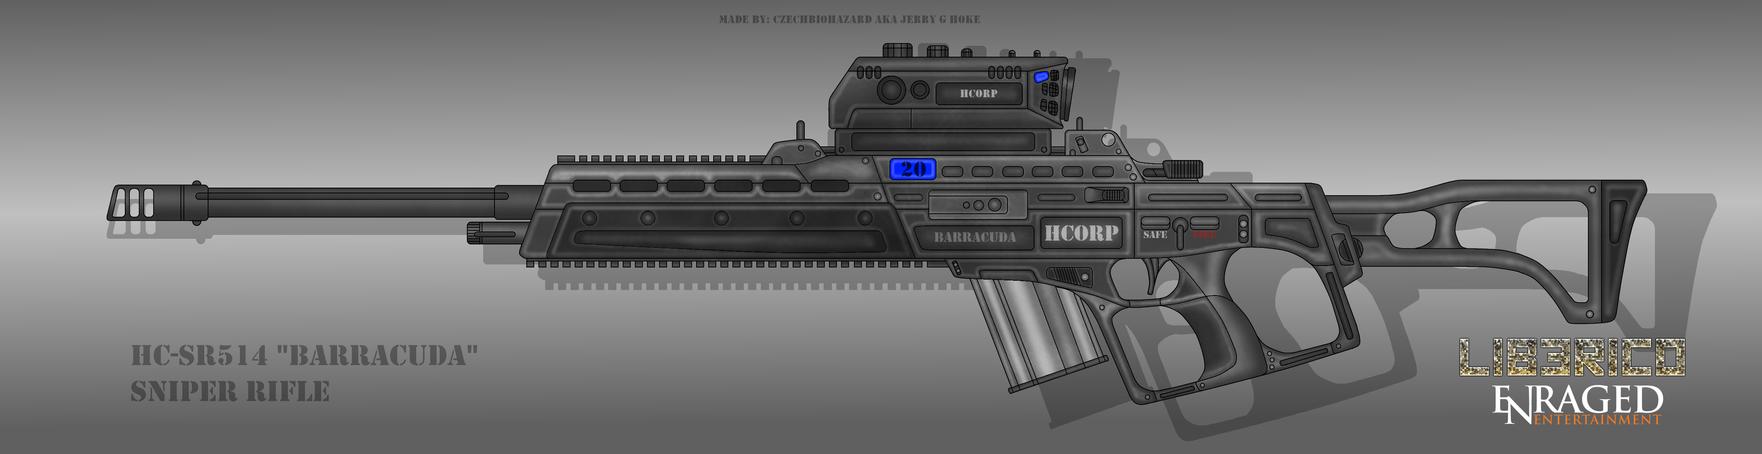 Fictional Firearm: HC-SR514 Barracuda Sniper Rifle